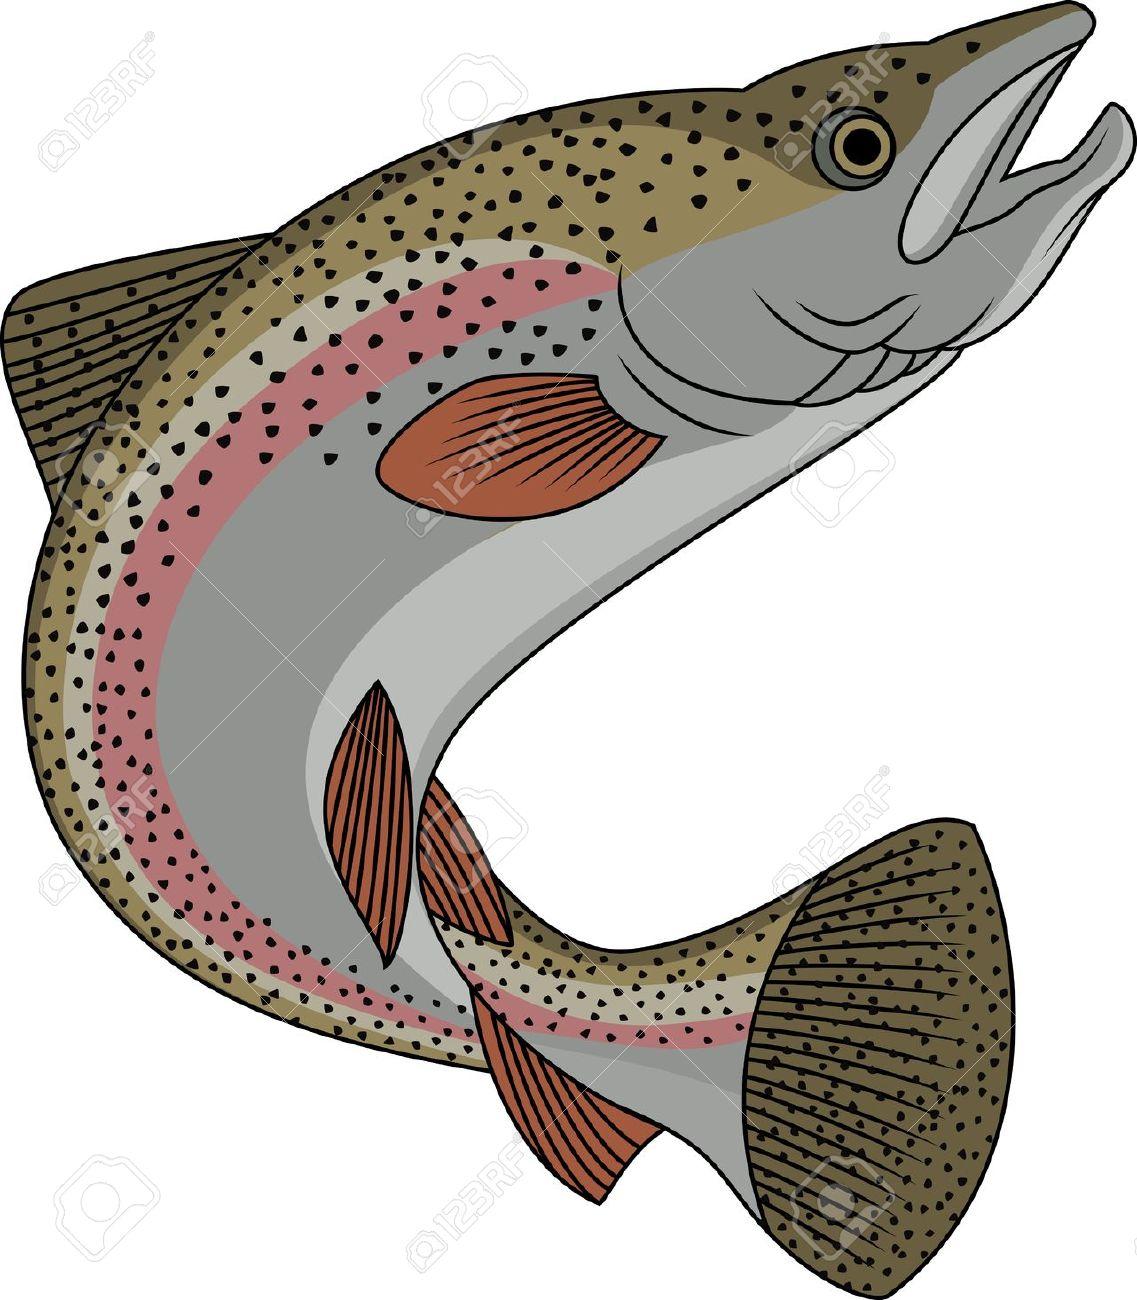 Rainbow trout clipart.